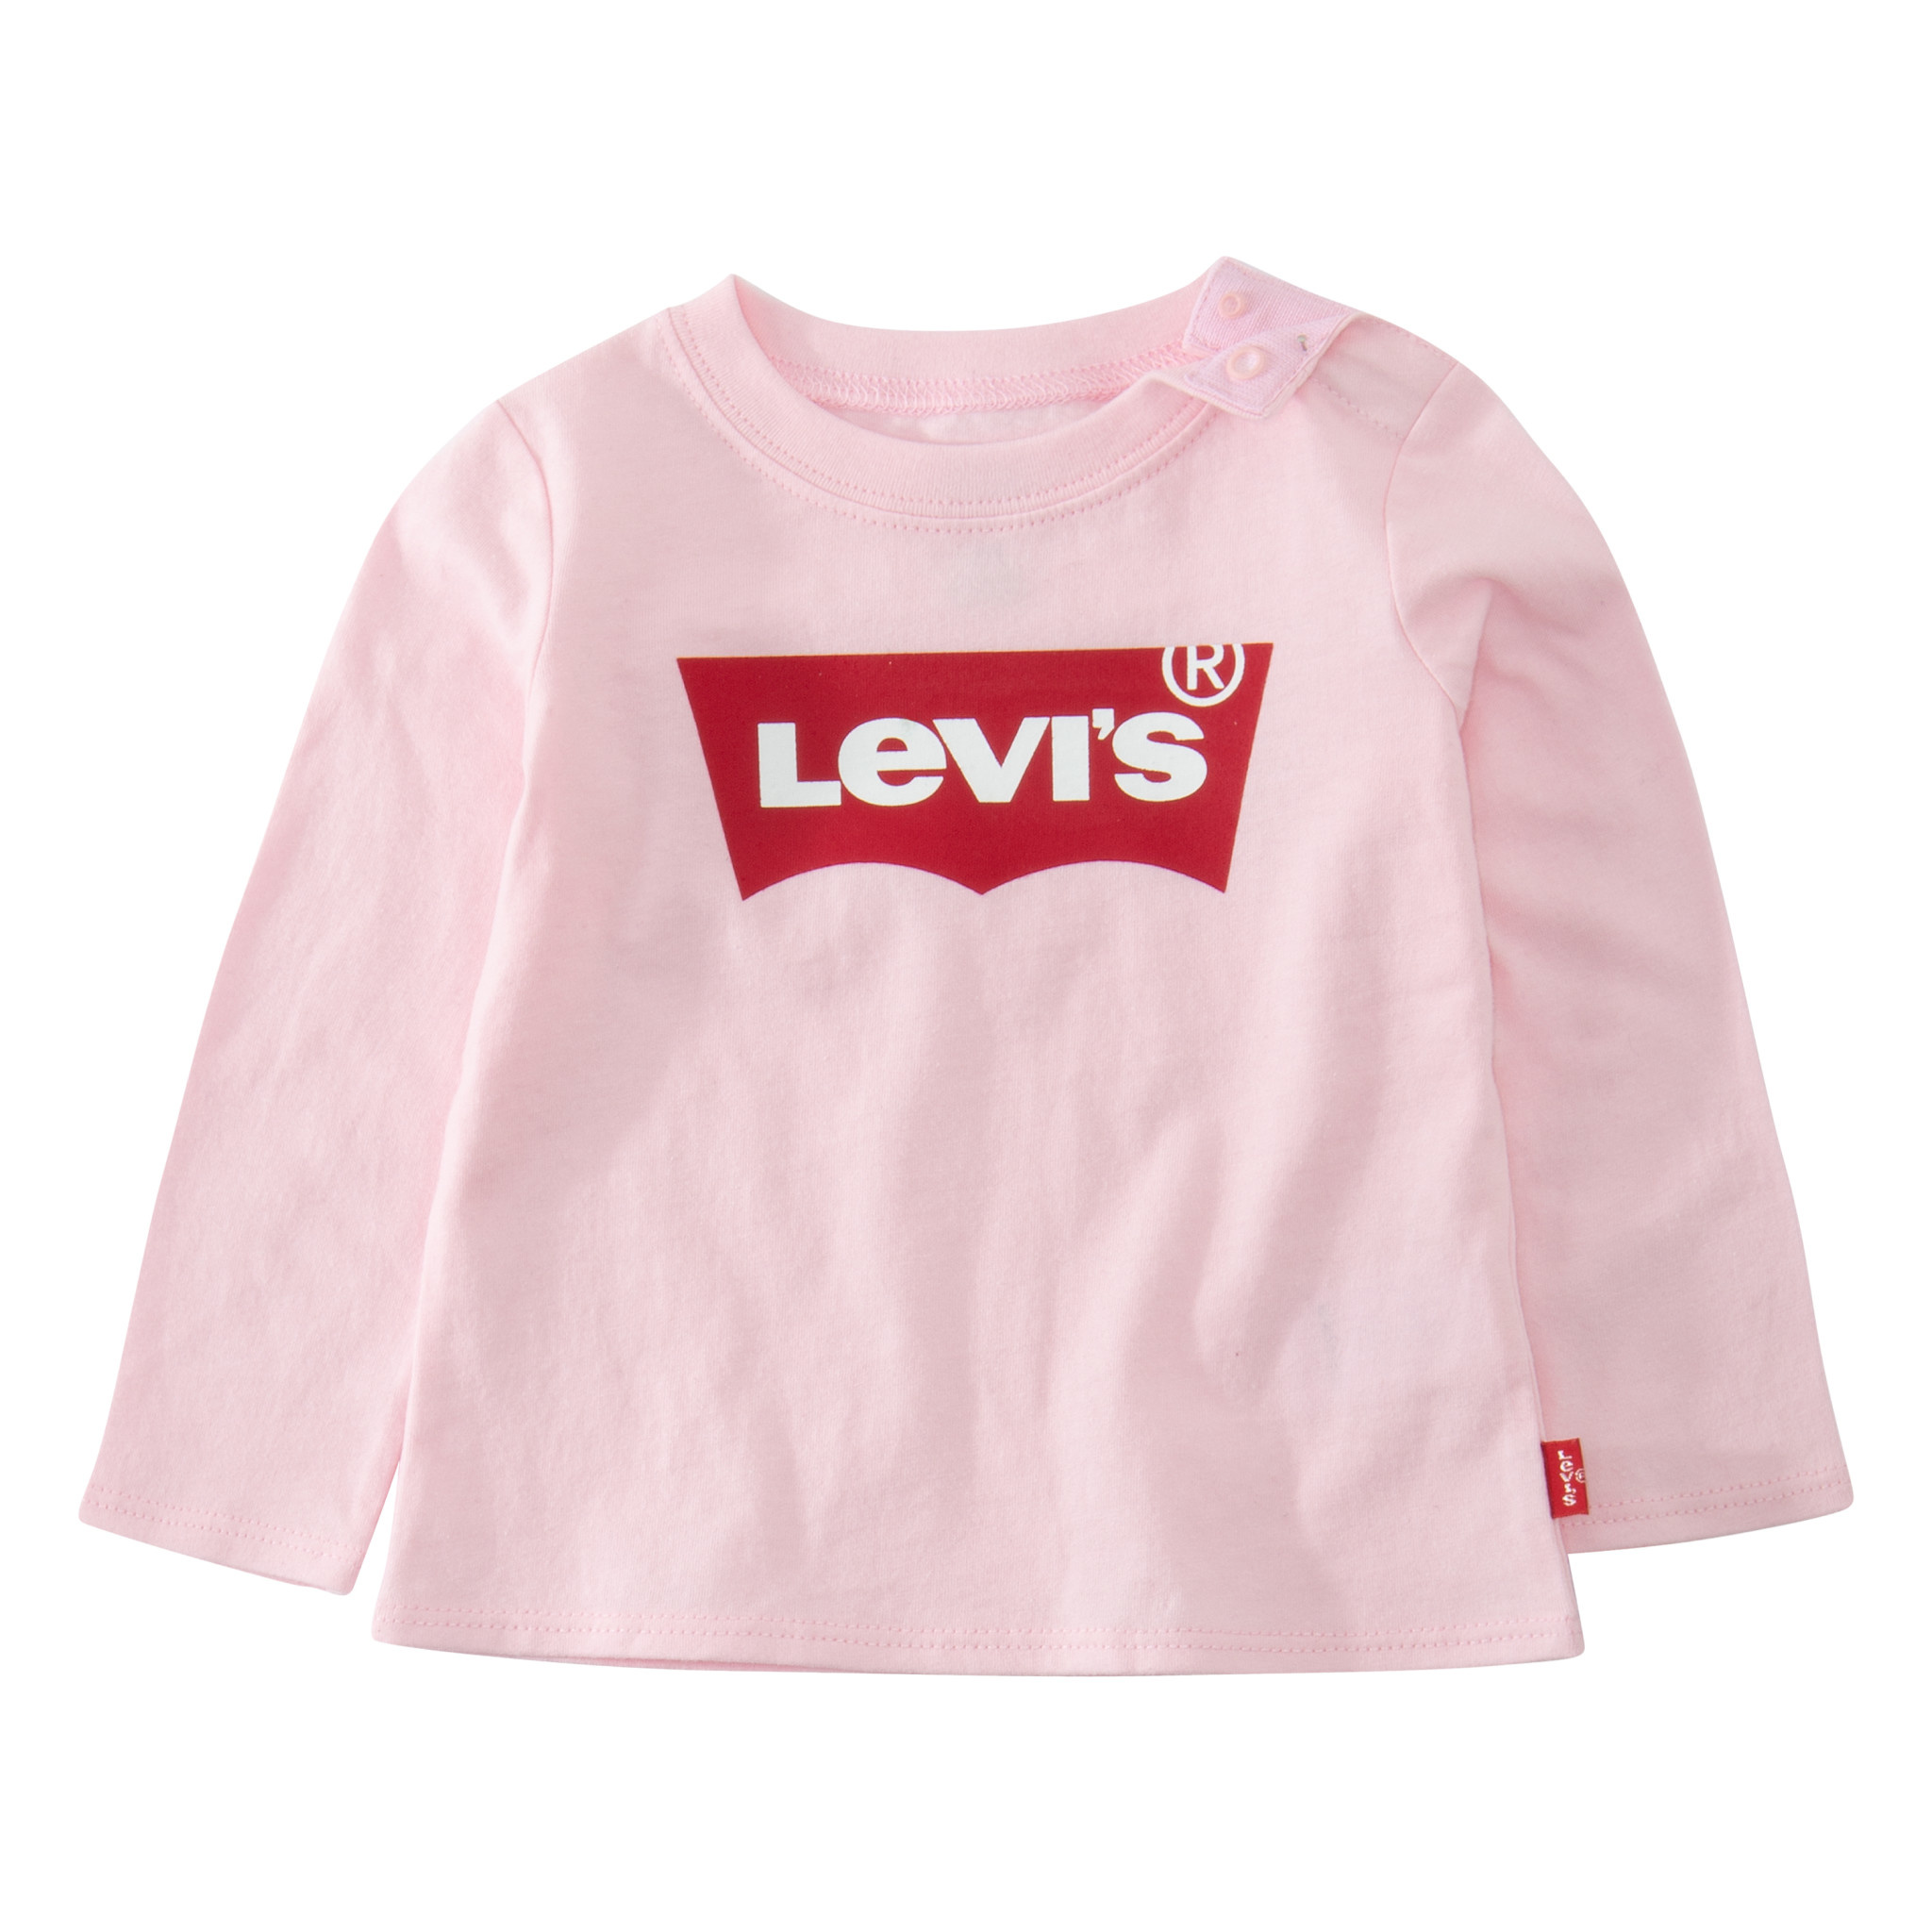 Levi's Tee shirt pink lady